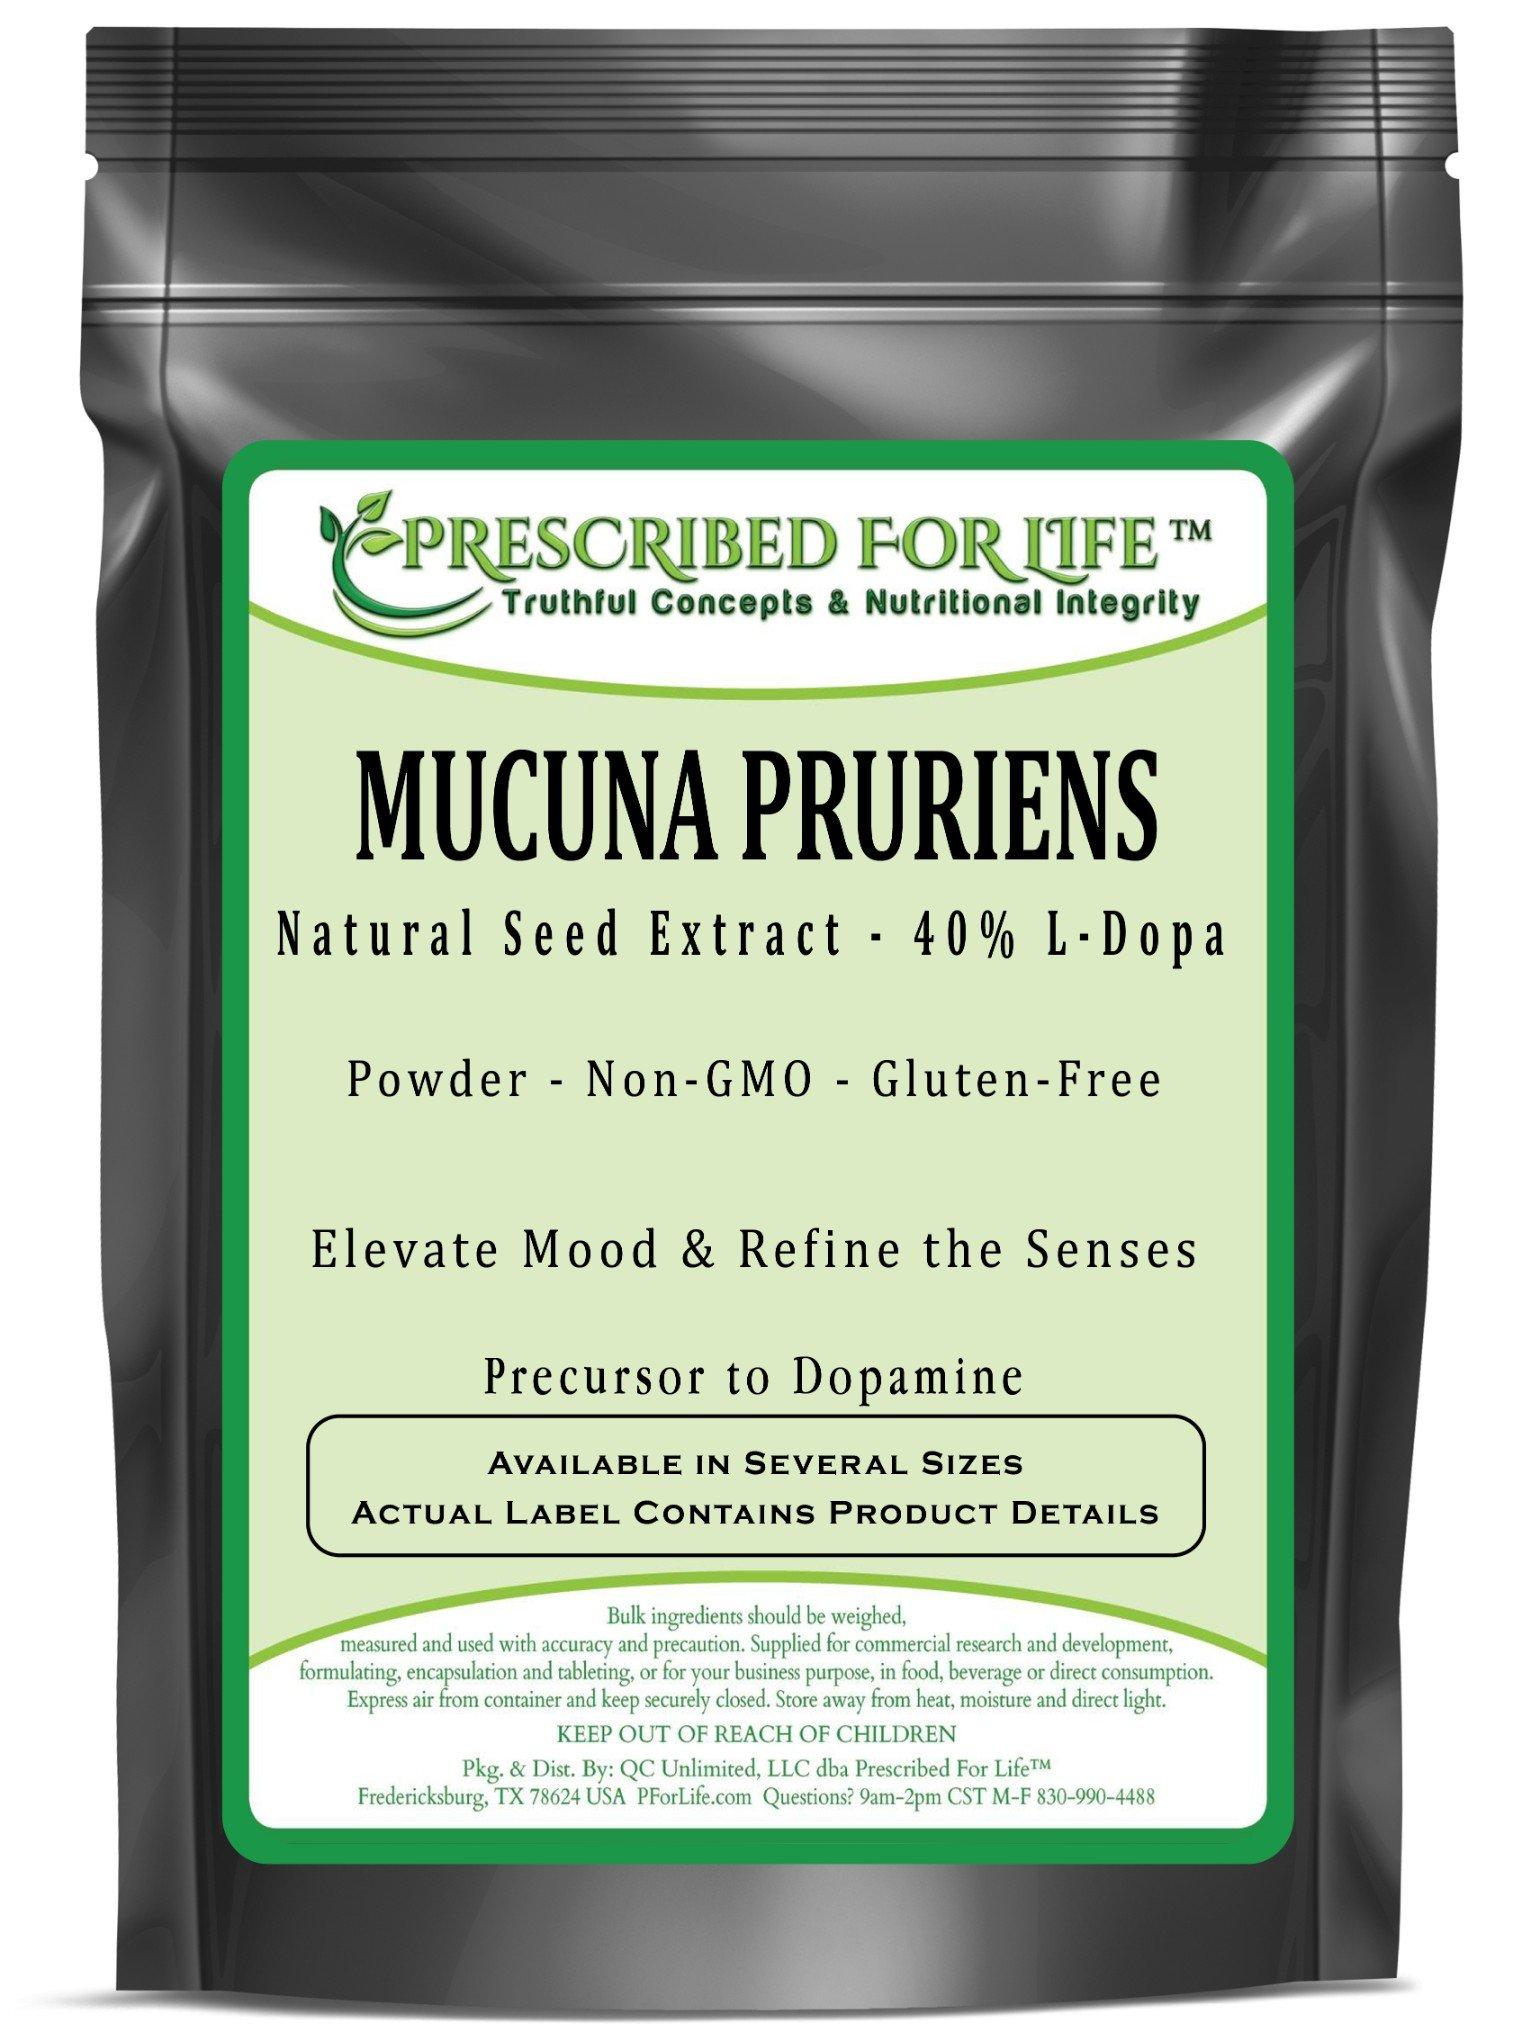 Mucuna Pruriens - Natural Seed Extract - 40% L-Dopa Powder, 1 kg